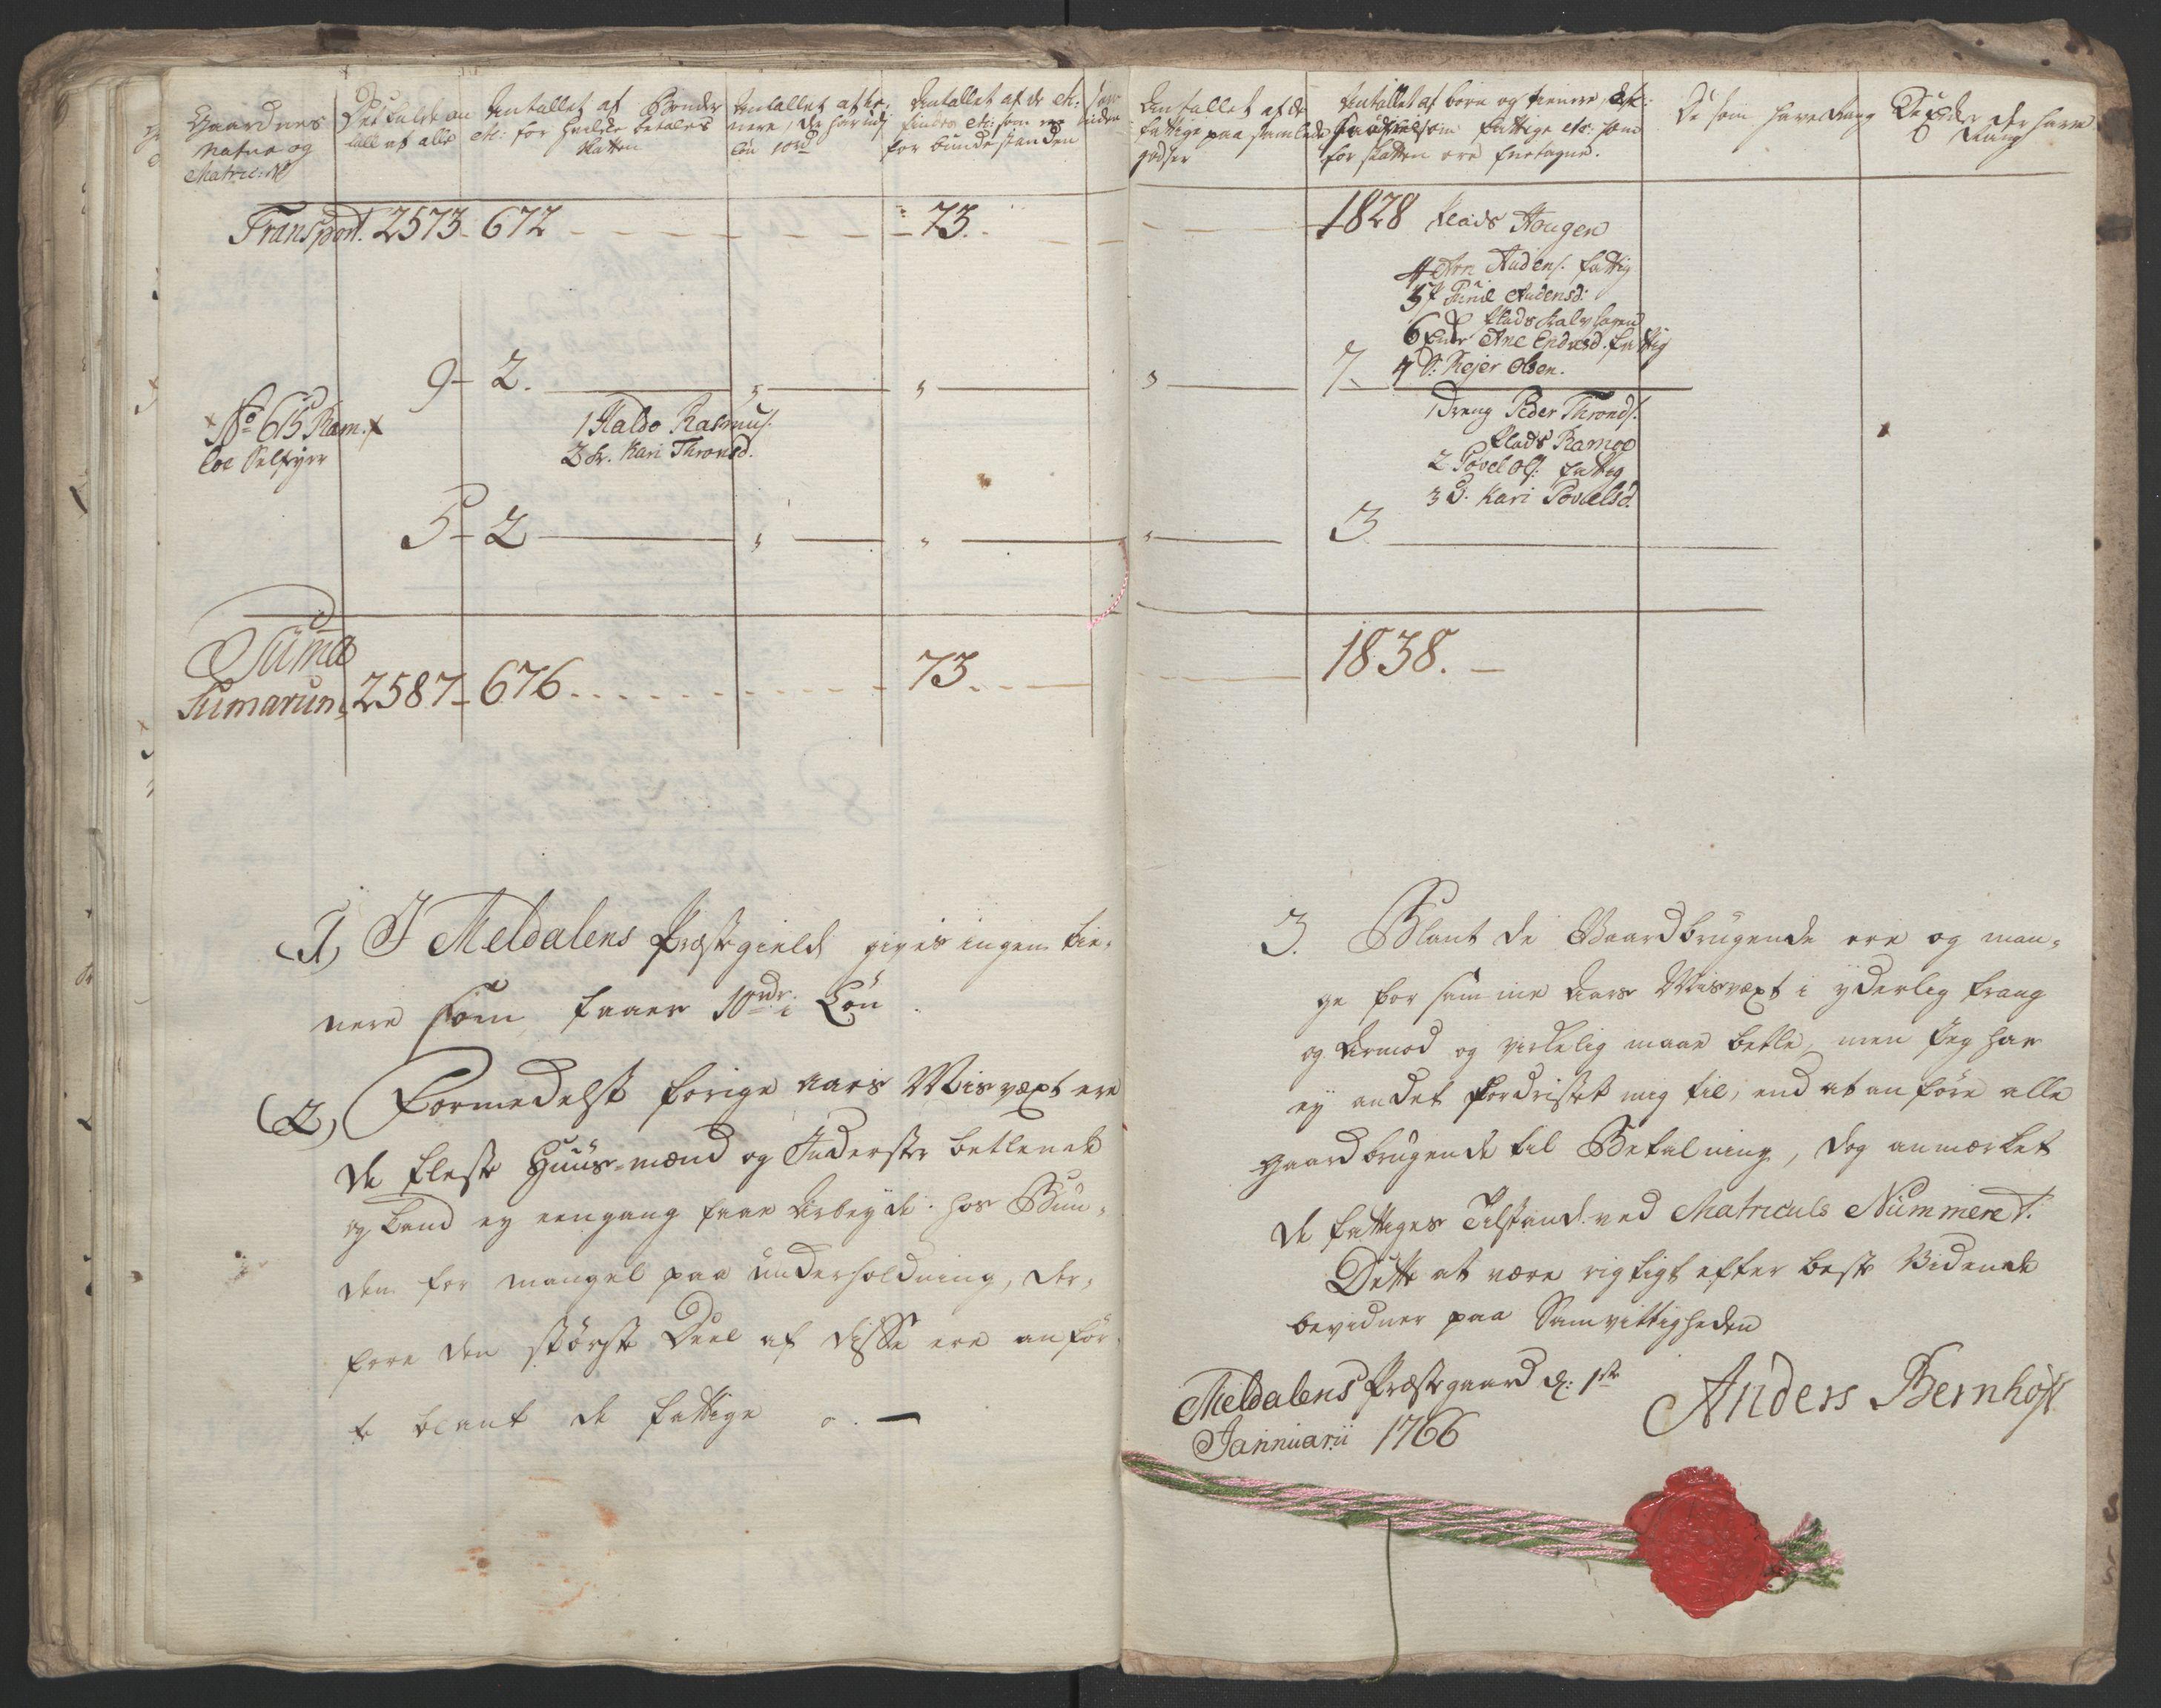 RA, Rentekammeret inntil 1814, Realistisk ordnet avdeling, Ol/L0021: [Gg 10]: Ekstraskatten, 23.09.1762. Orkdal og Gauldal, 1762-1767, s. 467